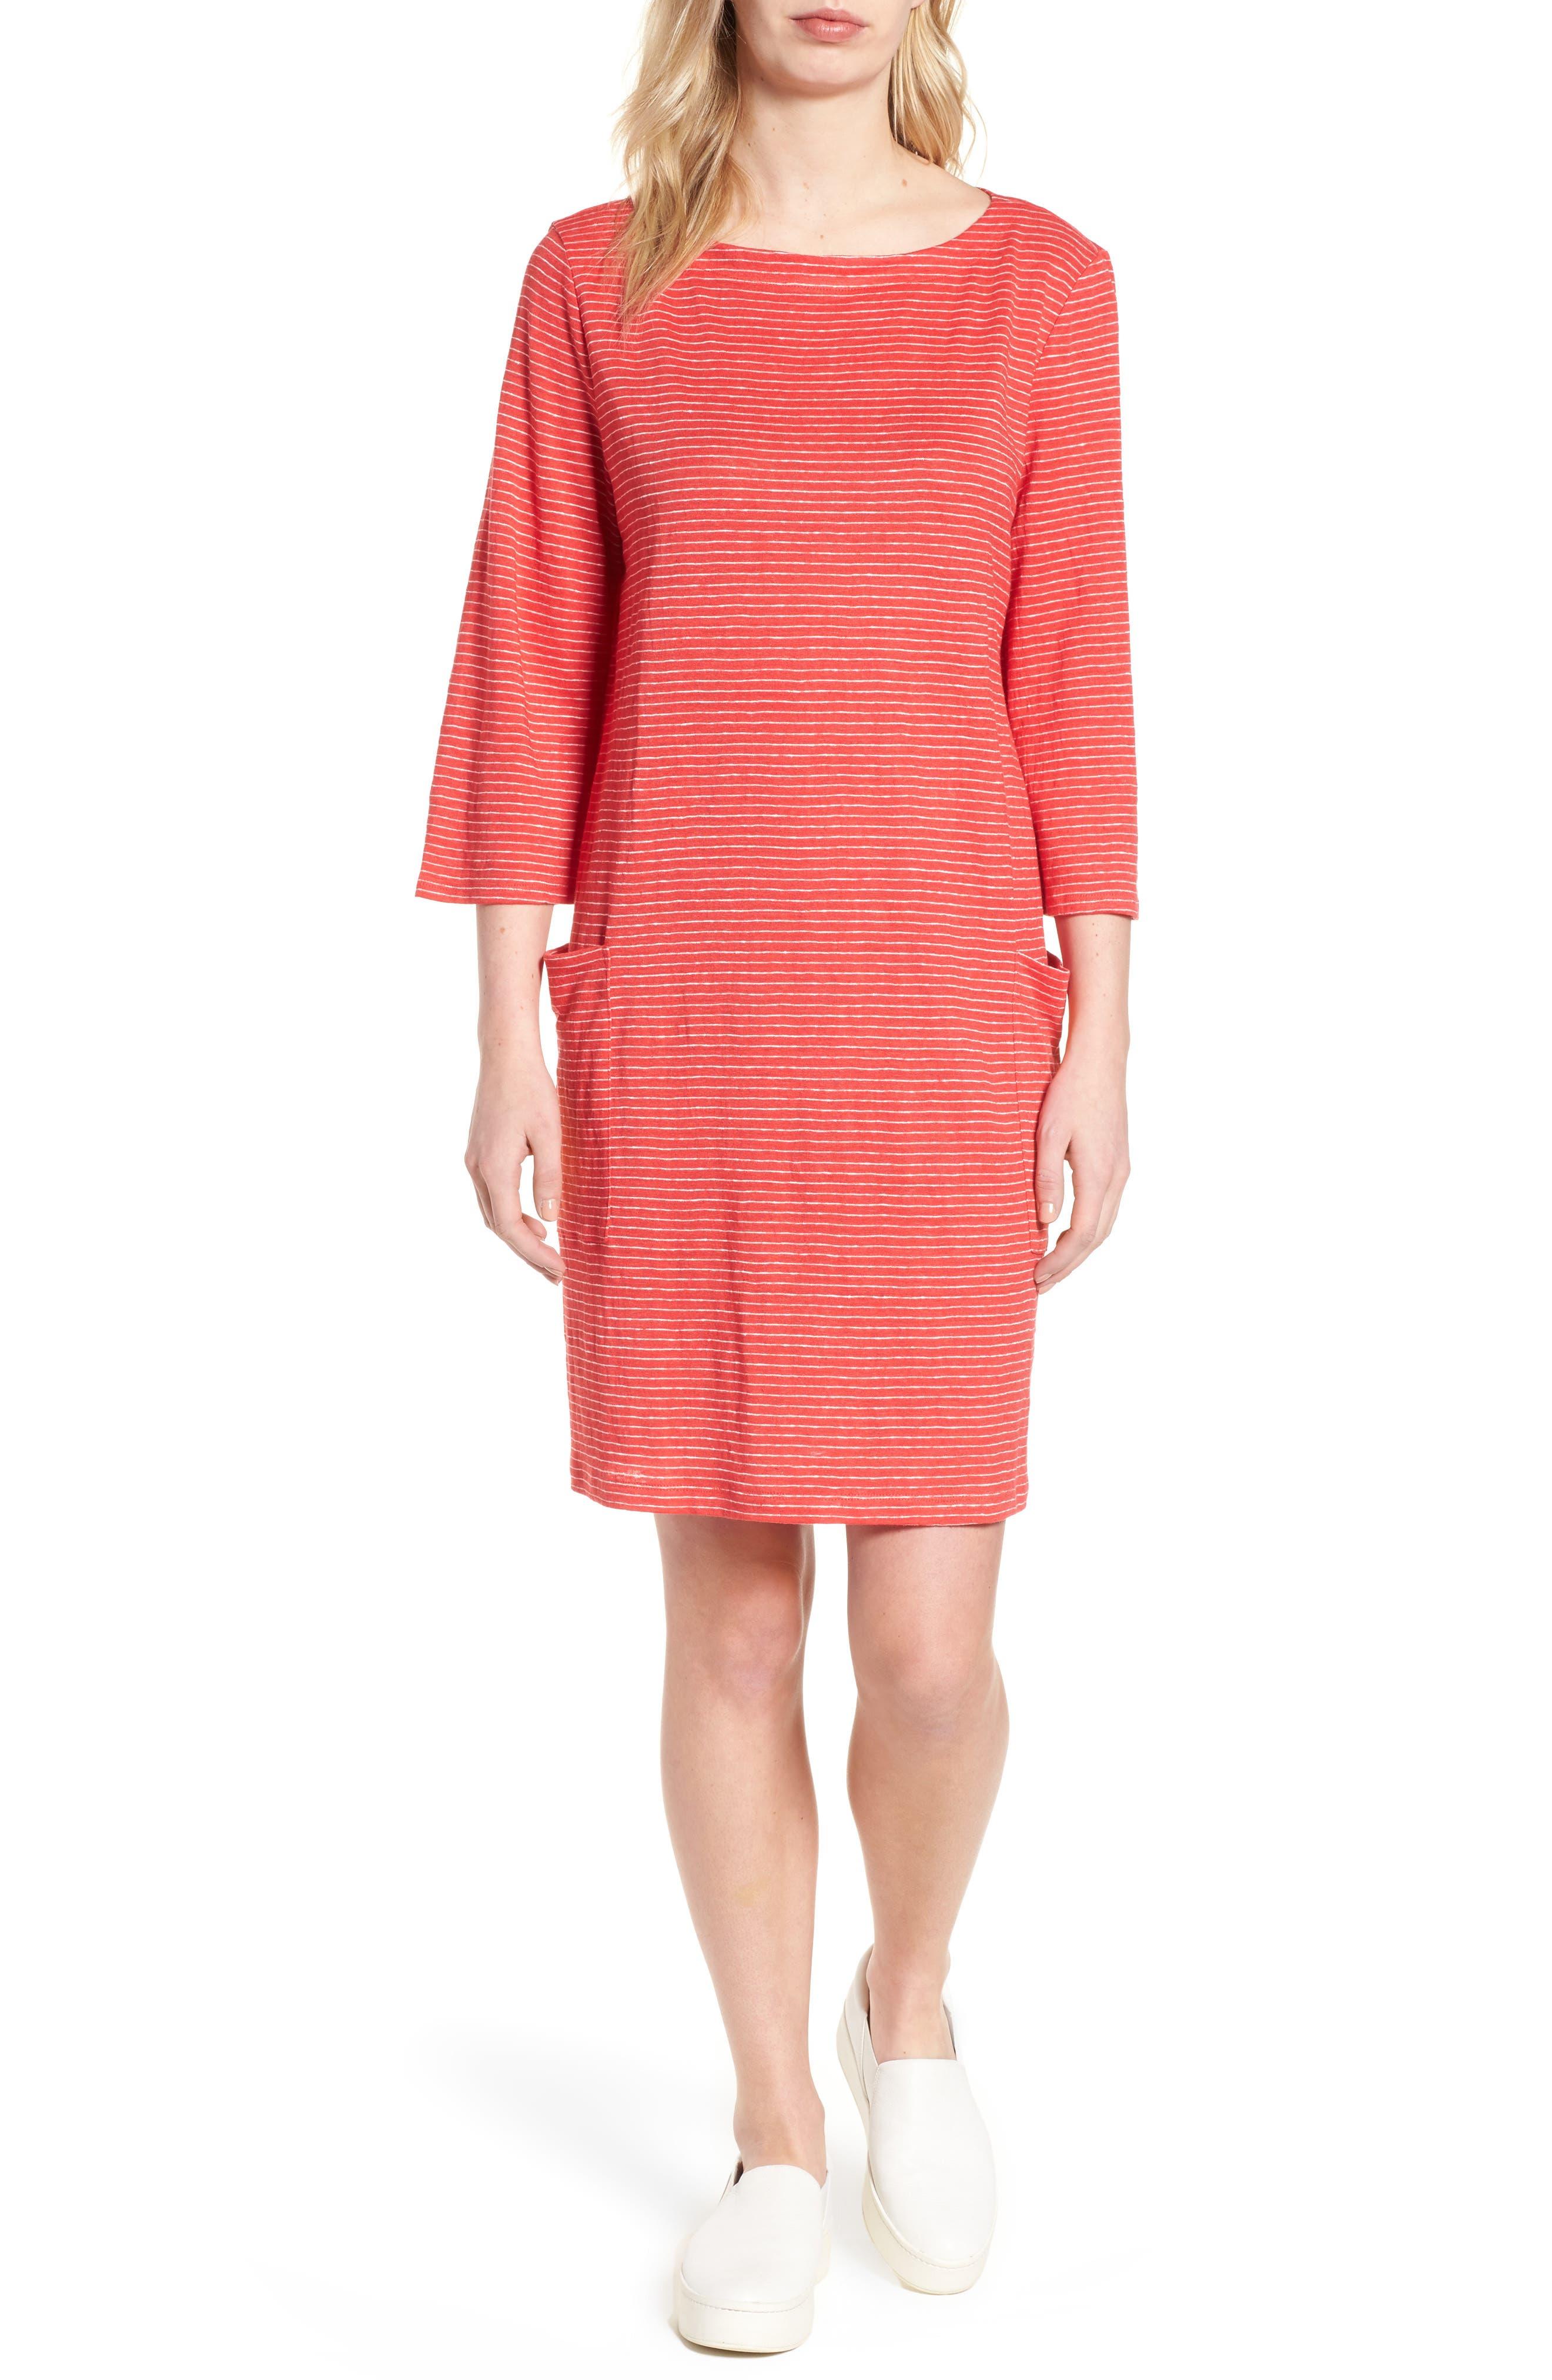 Organic Linen Shift Dress,                             Main thumbnail 1, color,                             Strawberry